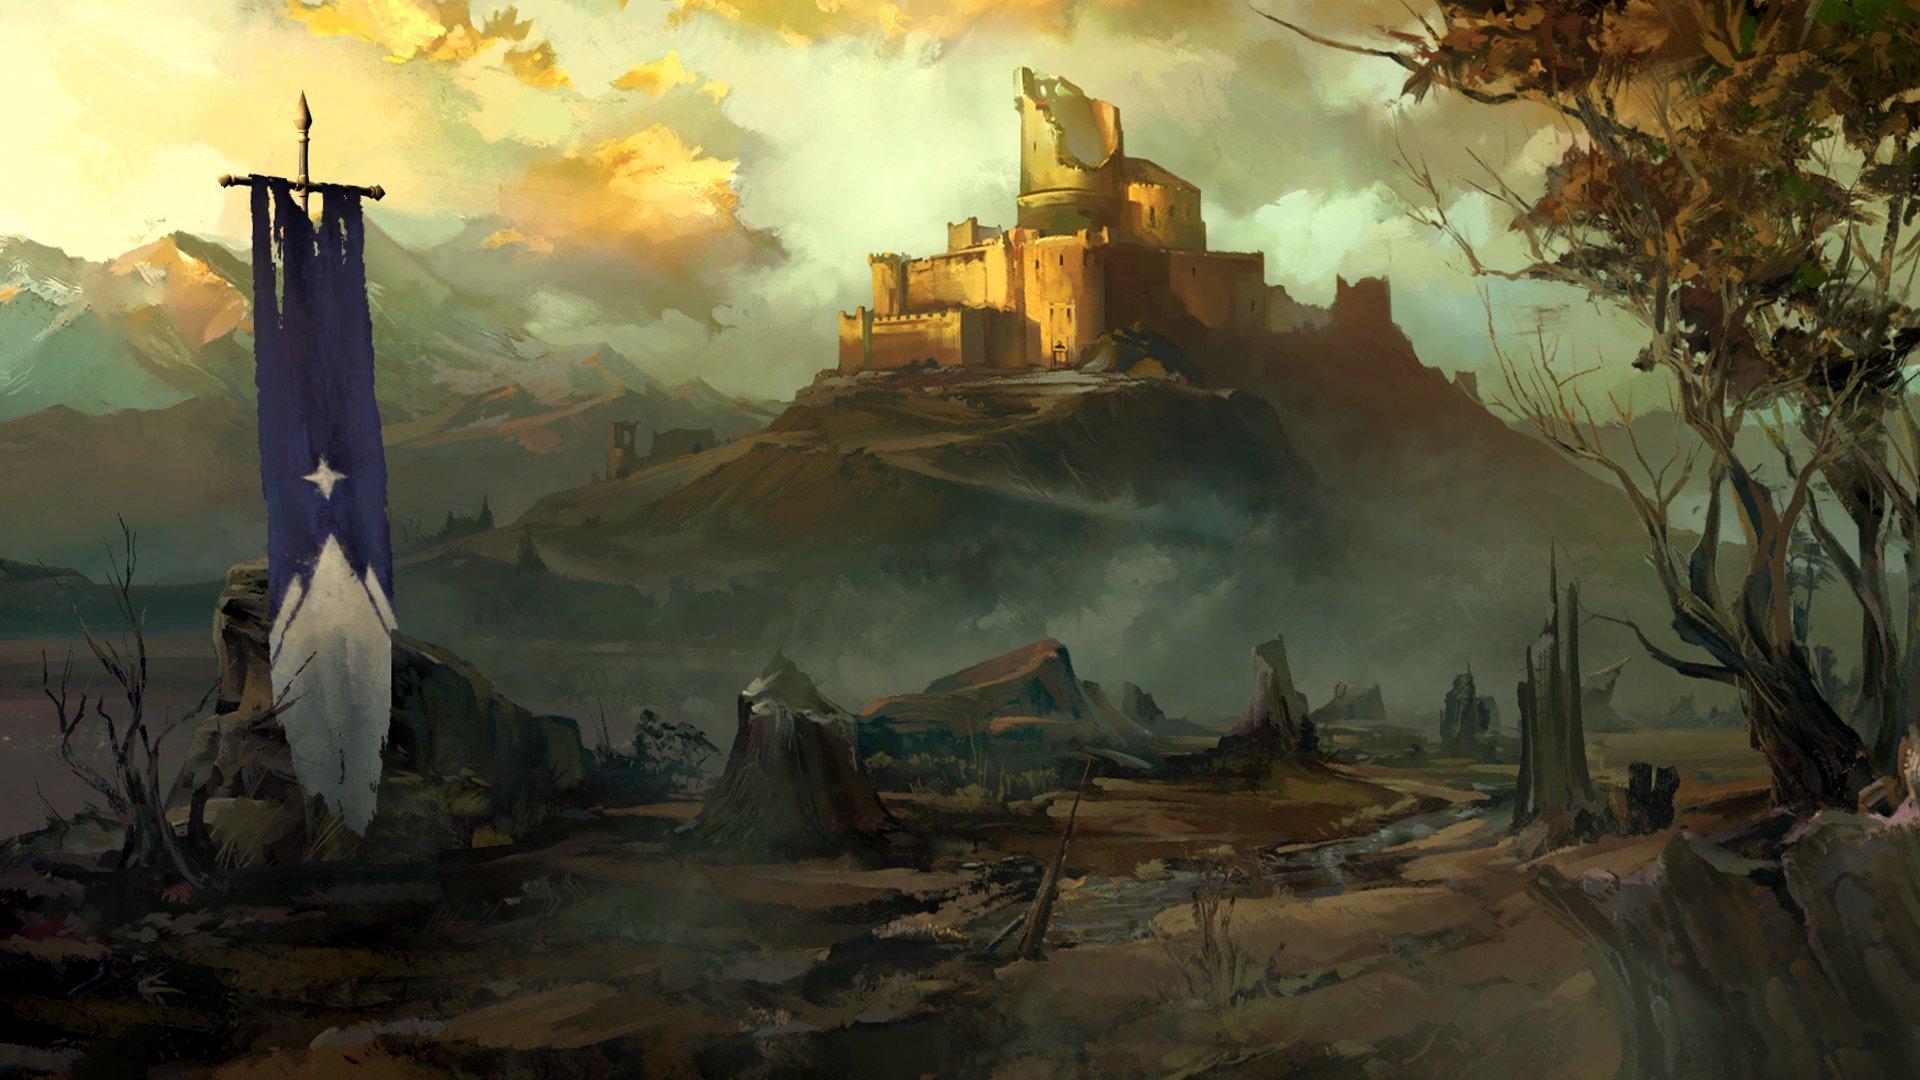 Game of Thrones - Episode 4 'Sons of Winter' Screens. - Изображение 1